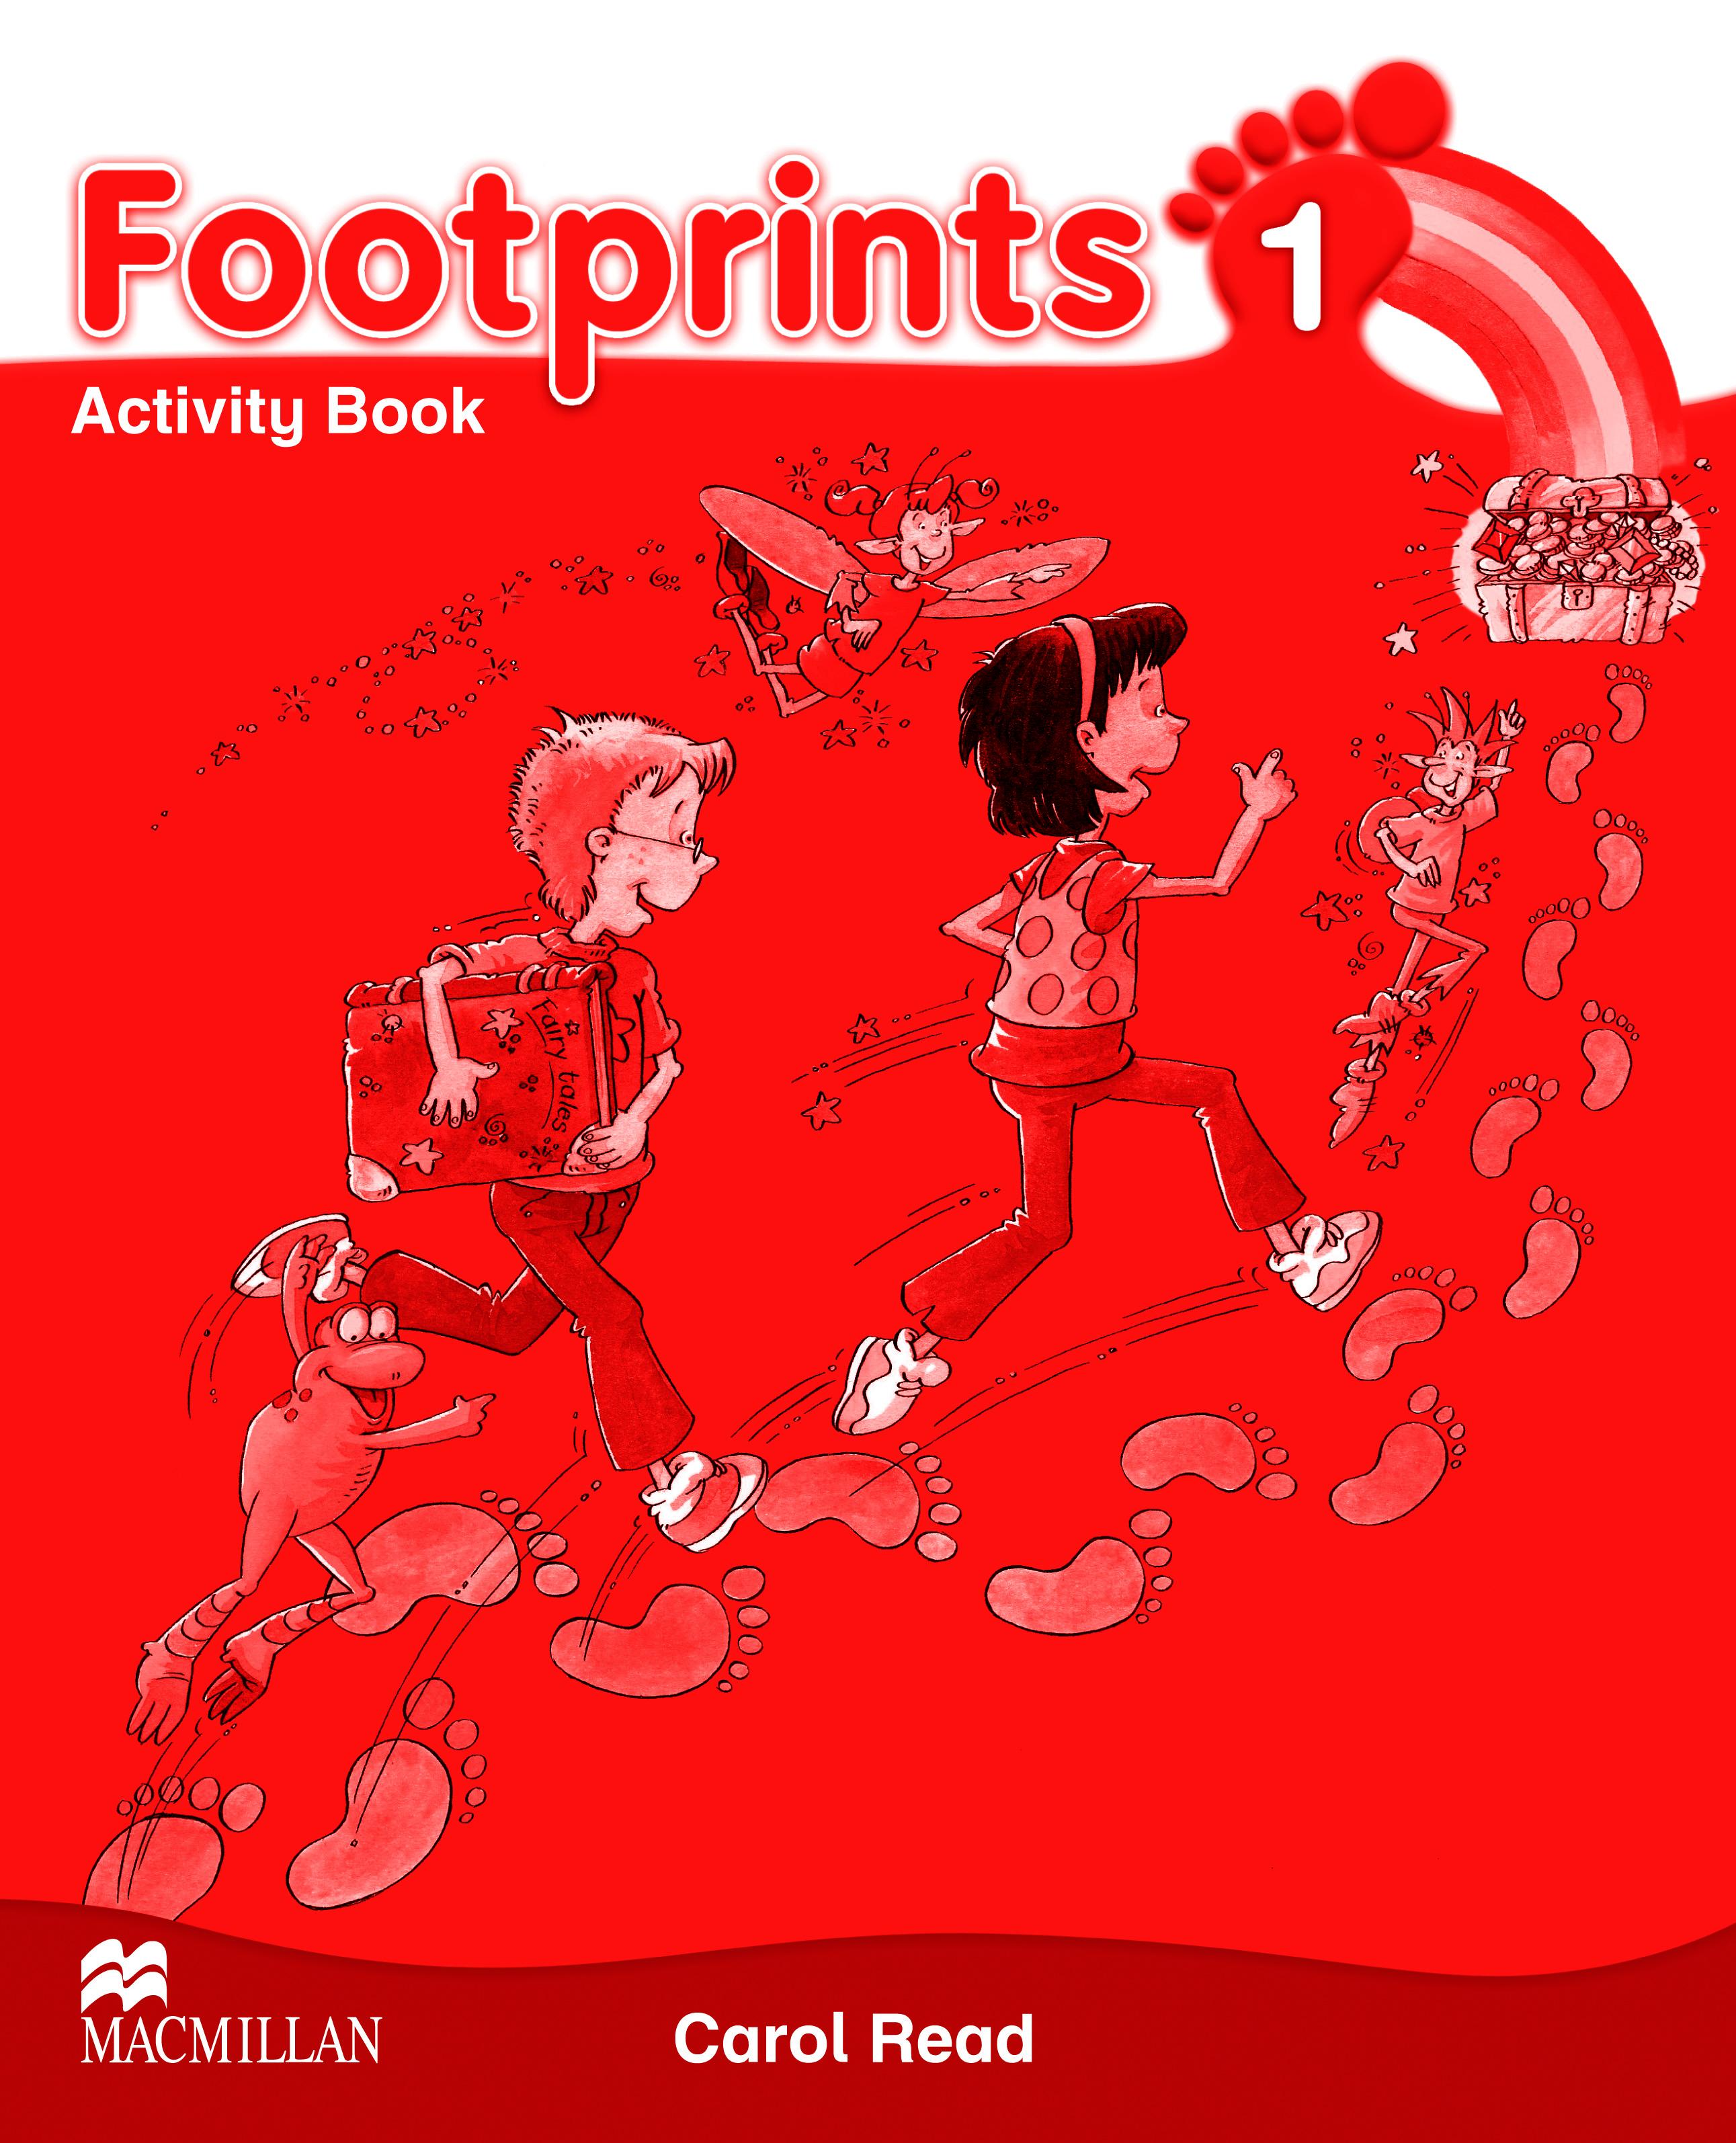 Footprints 1 Activity Book